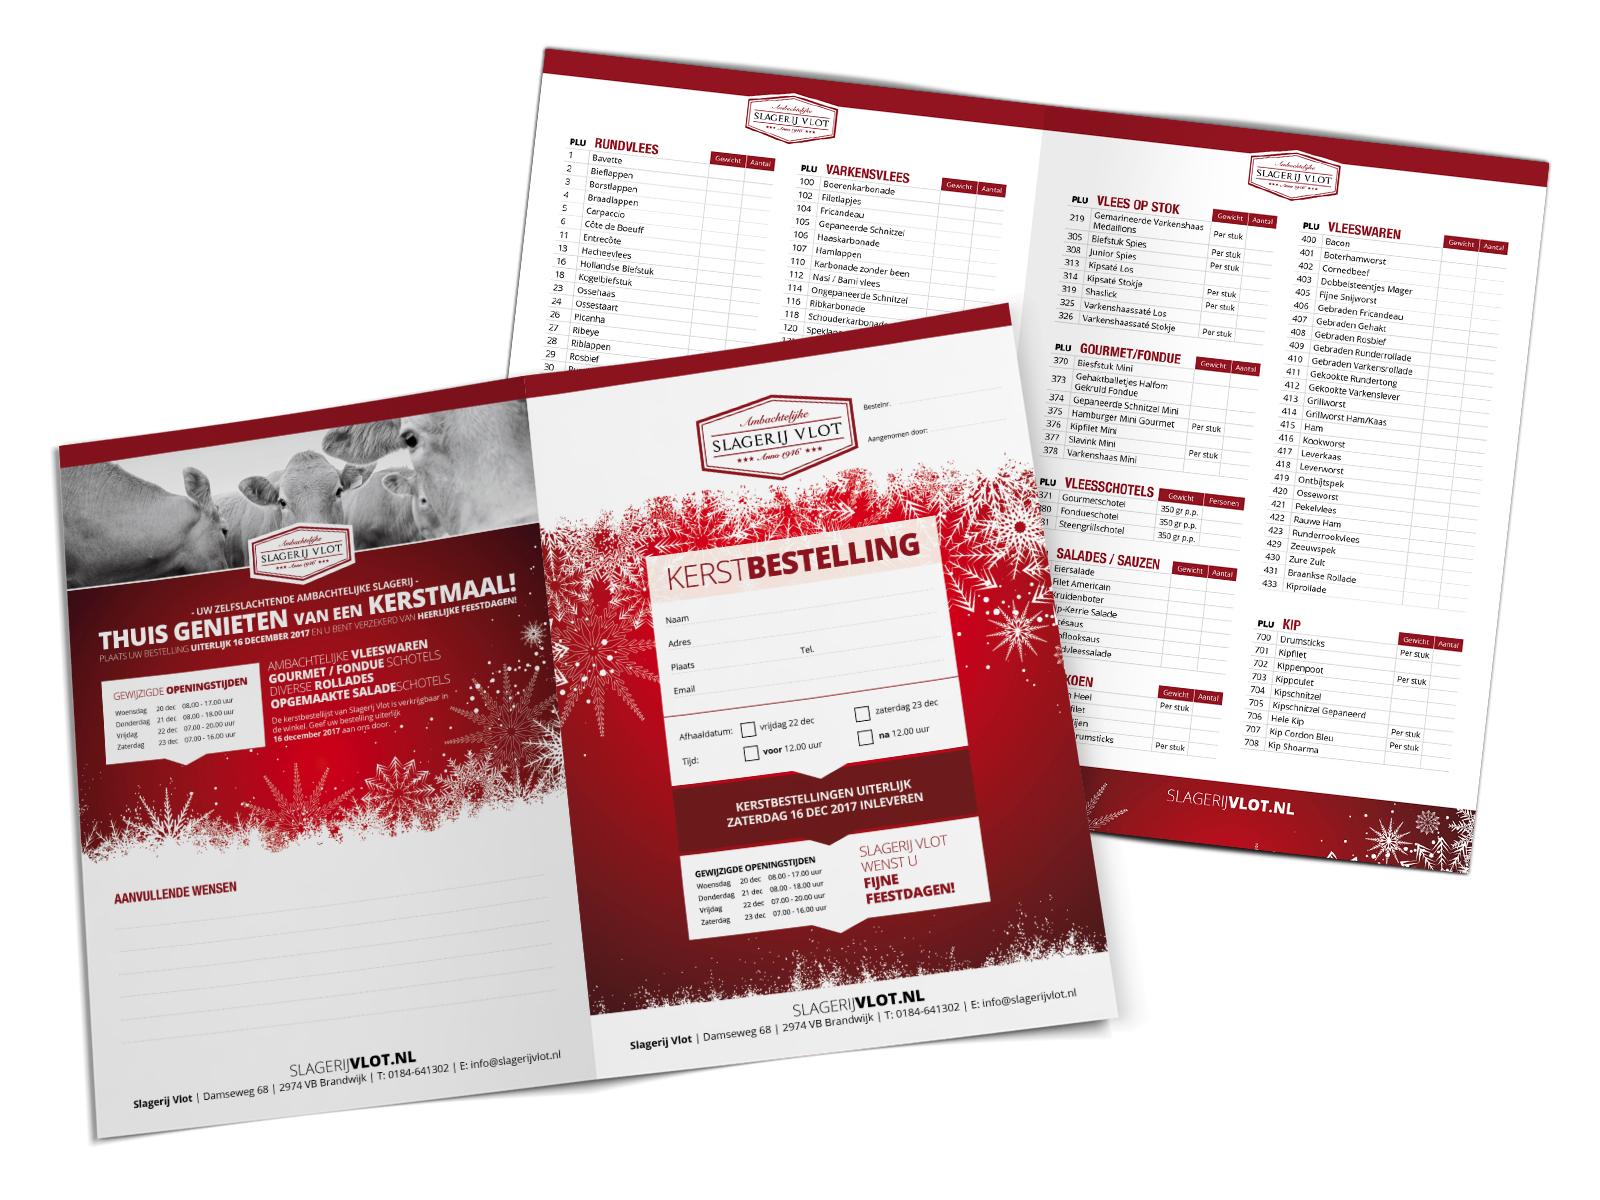 slagerij-vlot-kerst-bestellijst